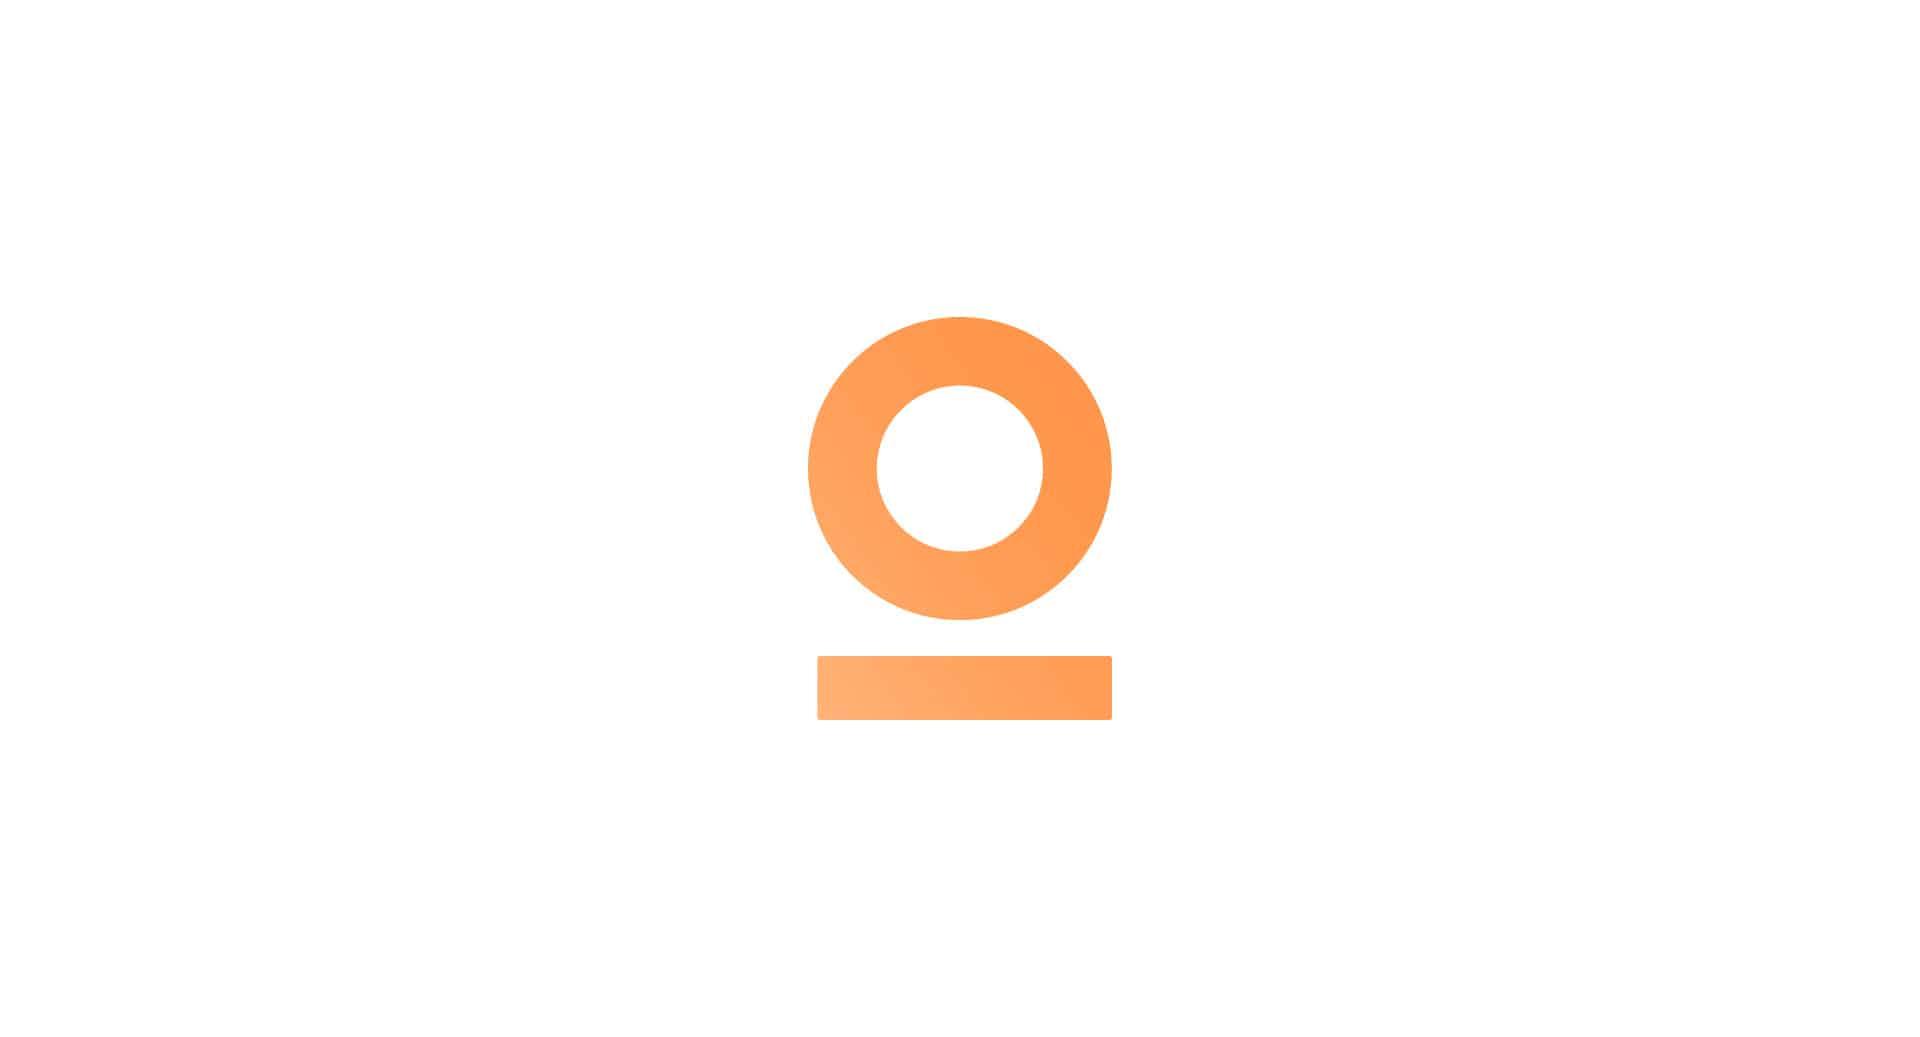 hobbes-icon-halfwidth